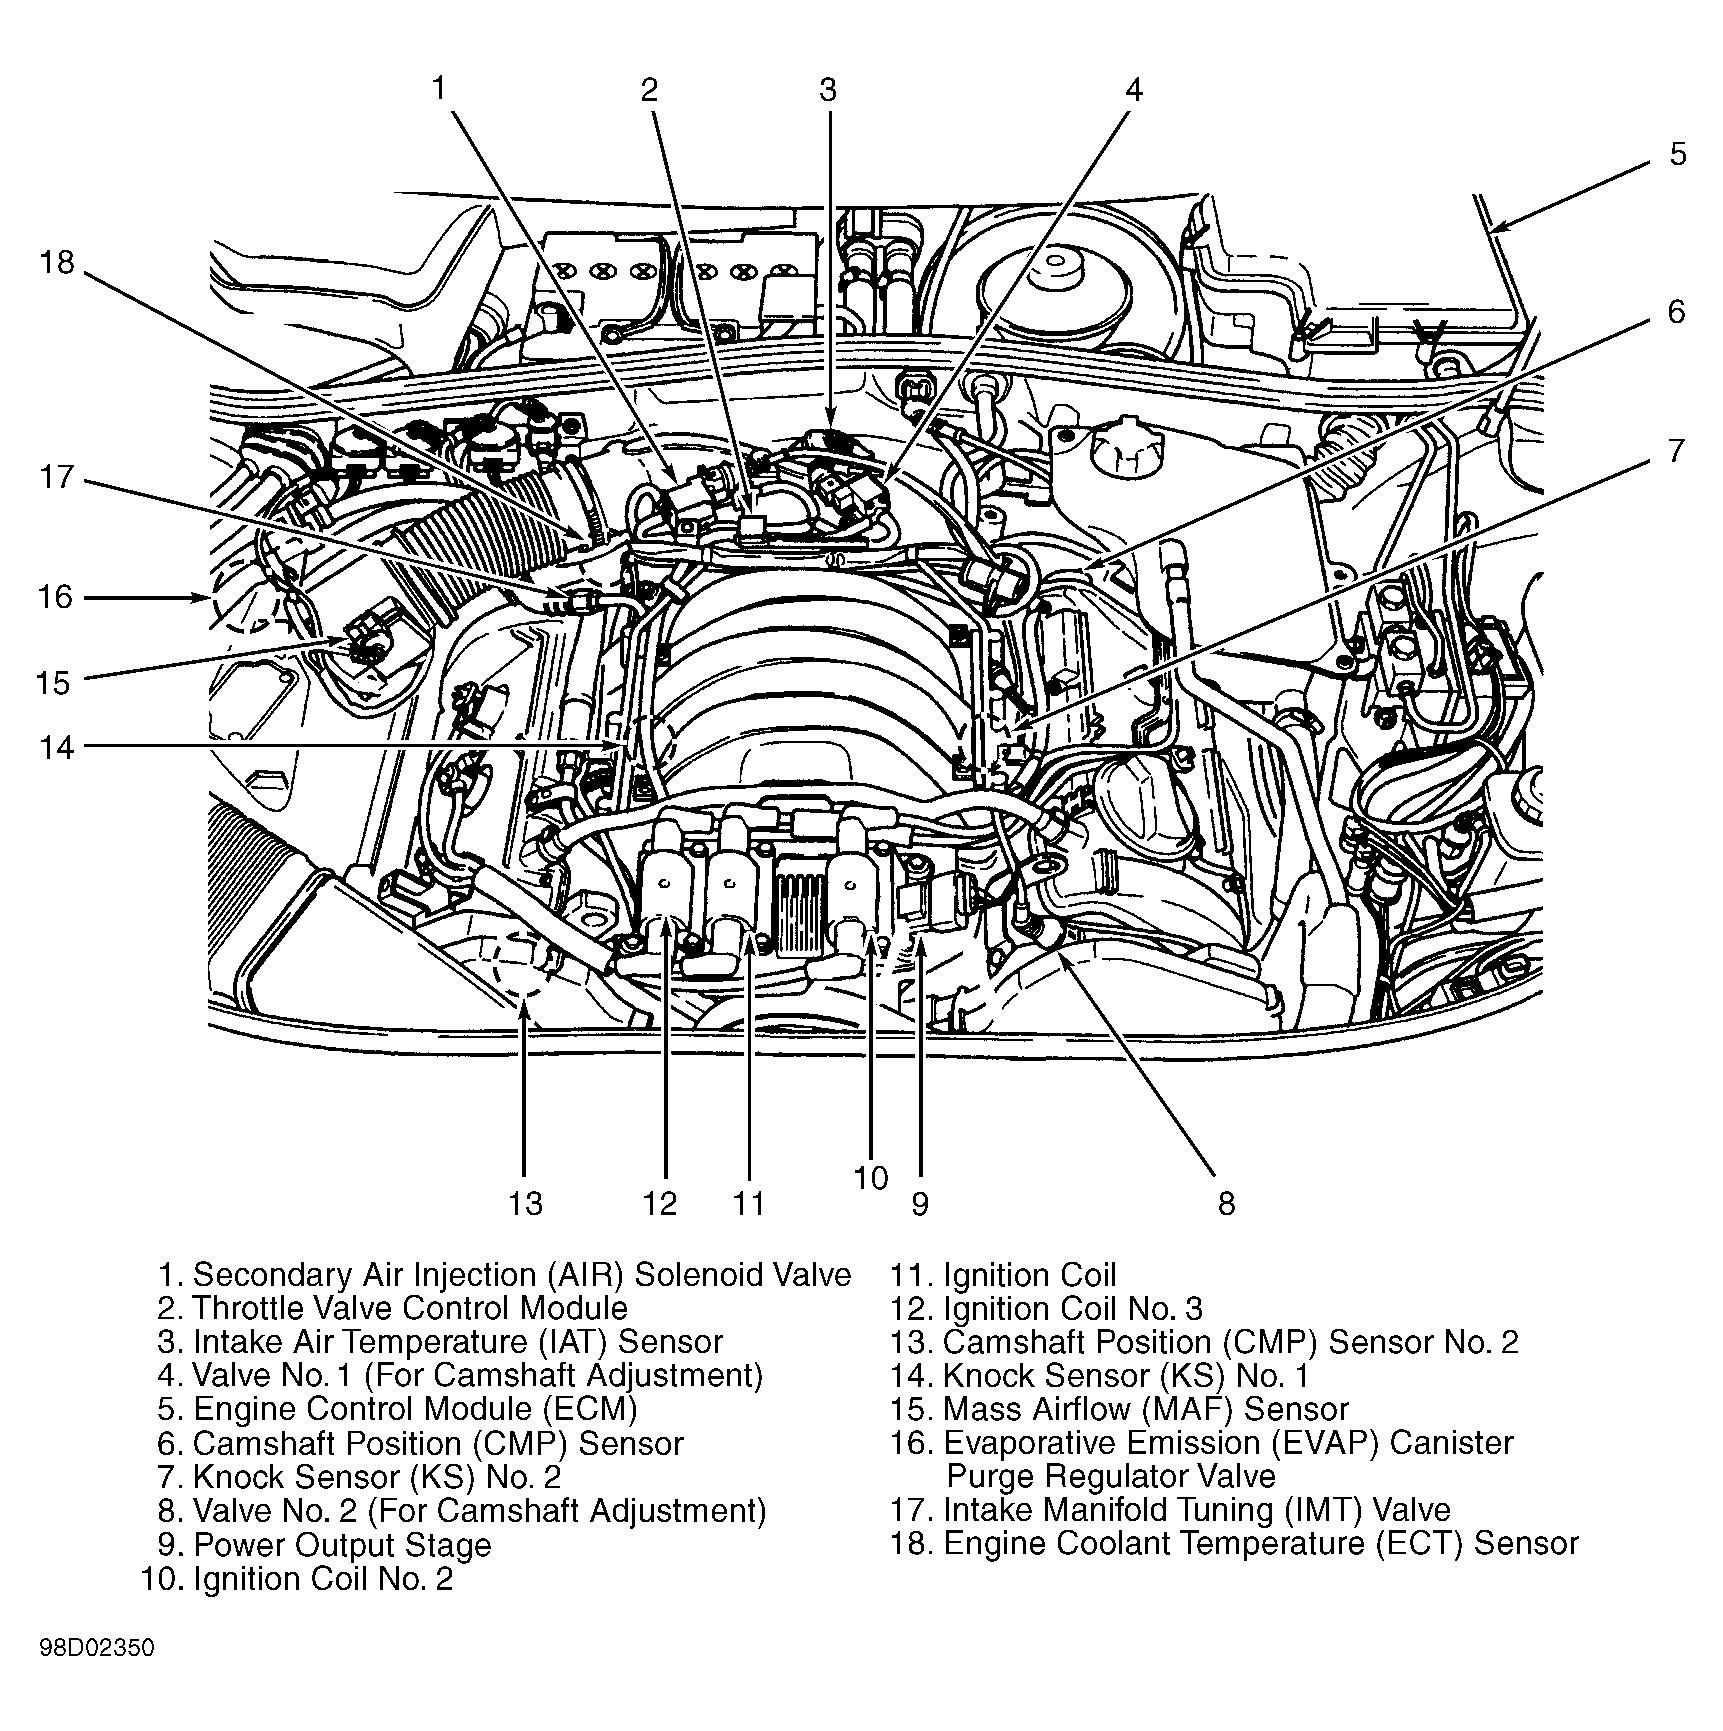 2002 dodge 2 0l engine diagram wiring diagram project 2009 Dodge Grand Caravan Wiring Diagram